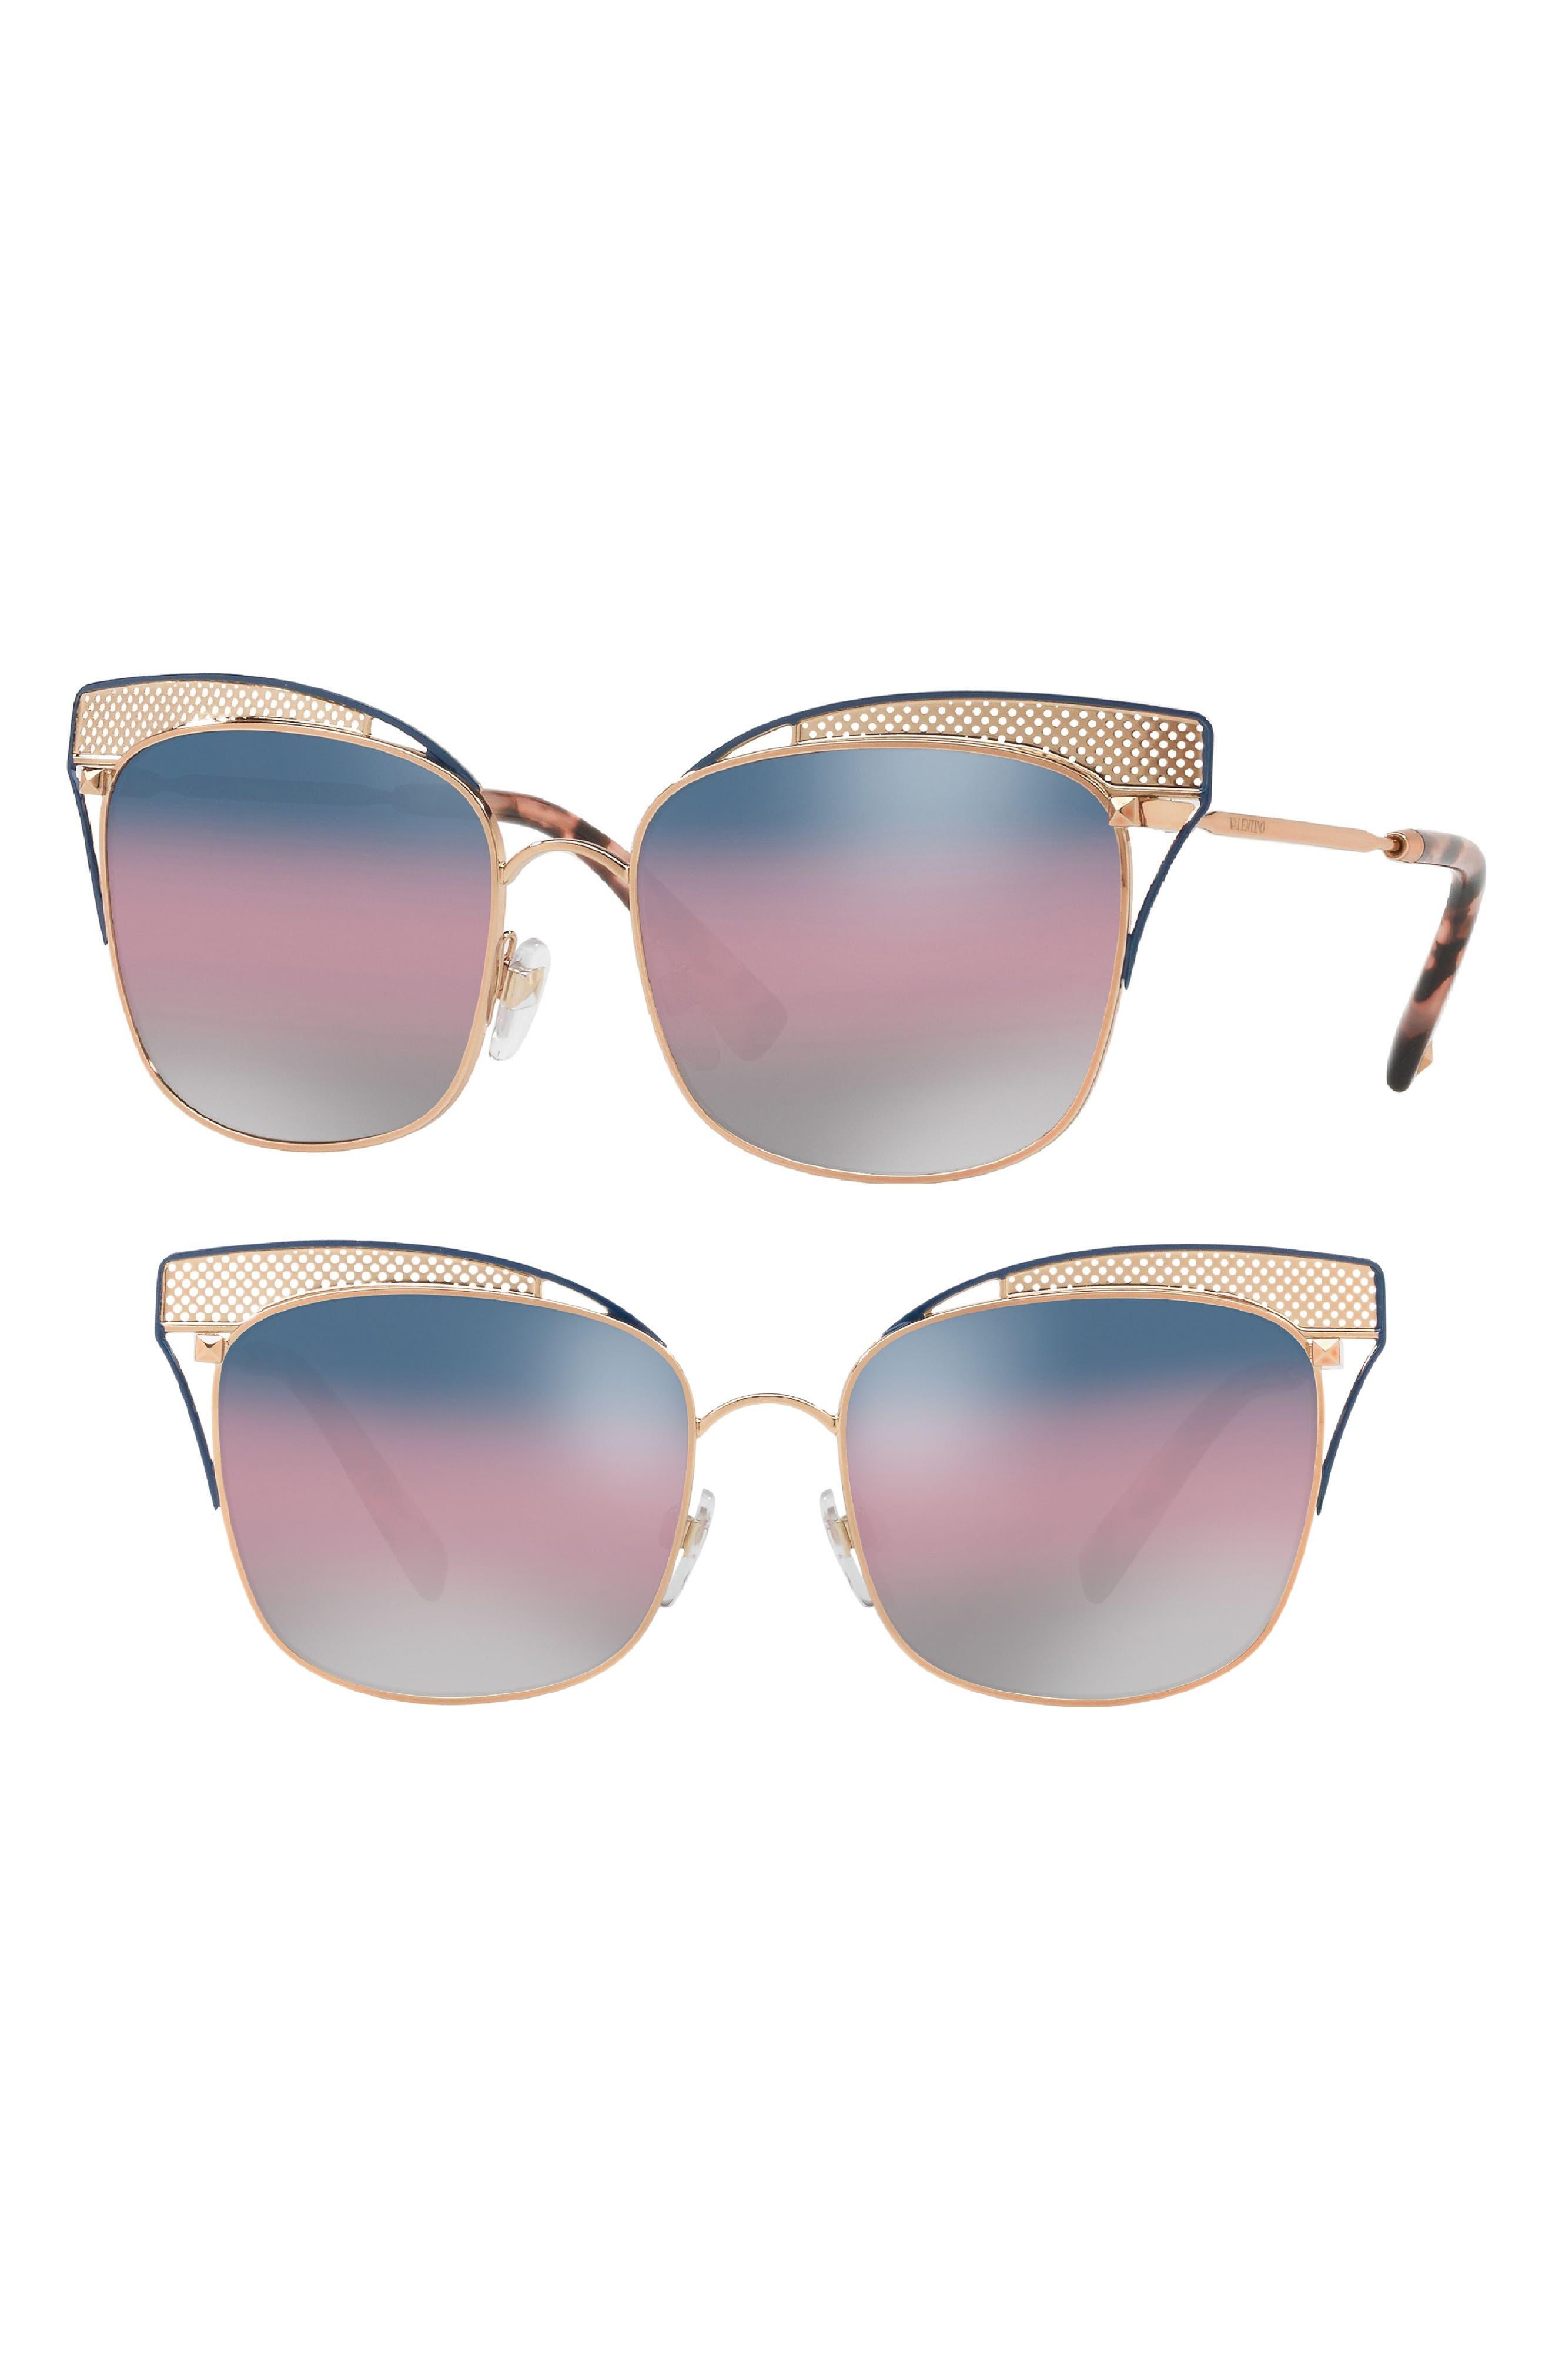 55mm Cat Eye Sunglasses,                             Main thumbnail 1, color,